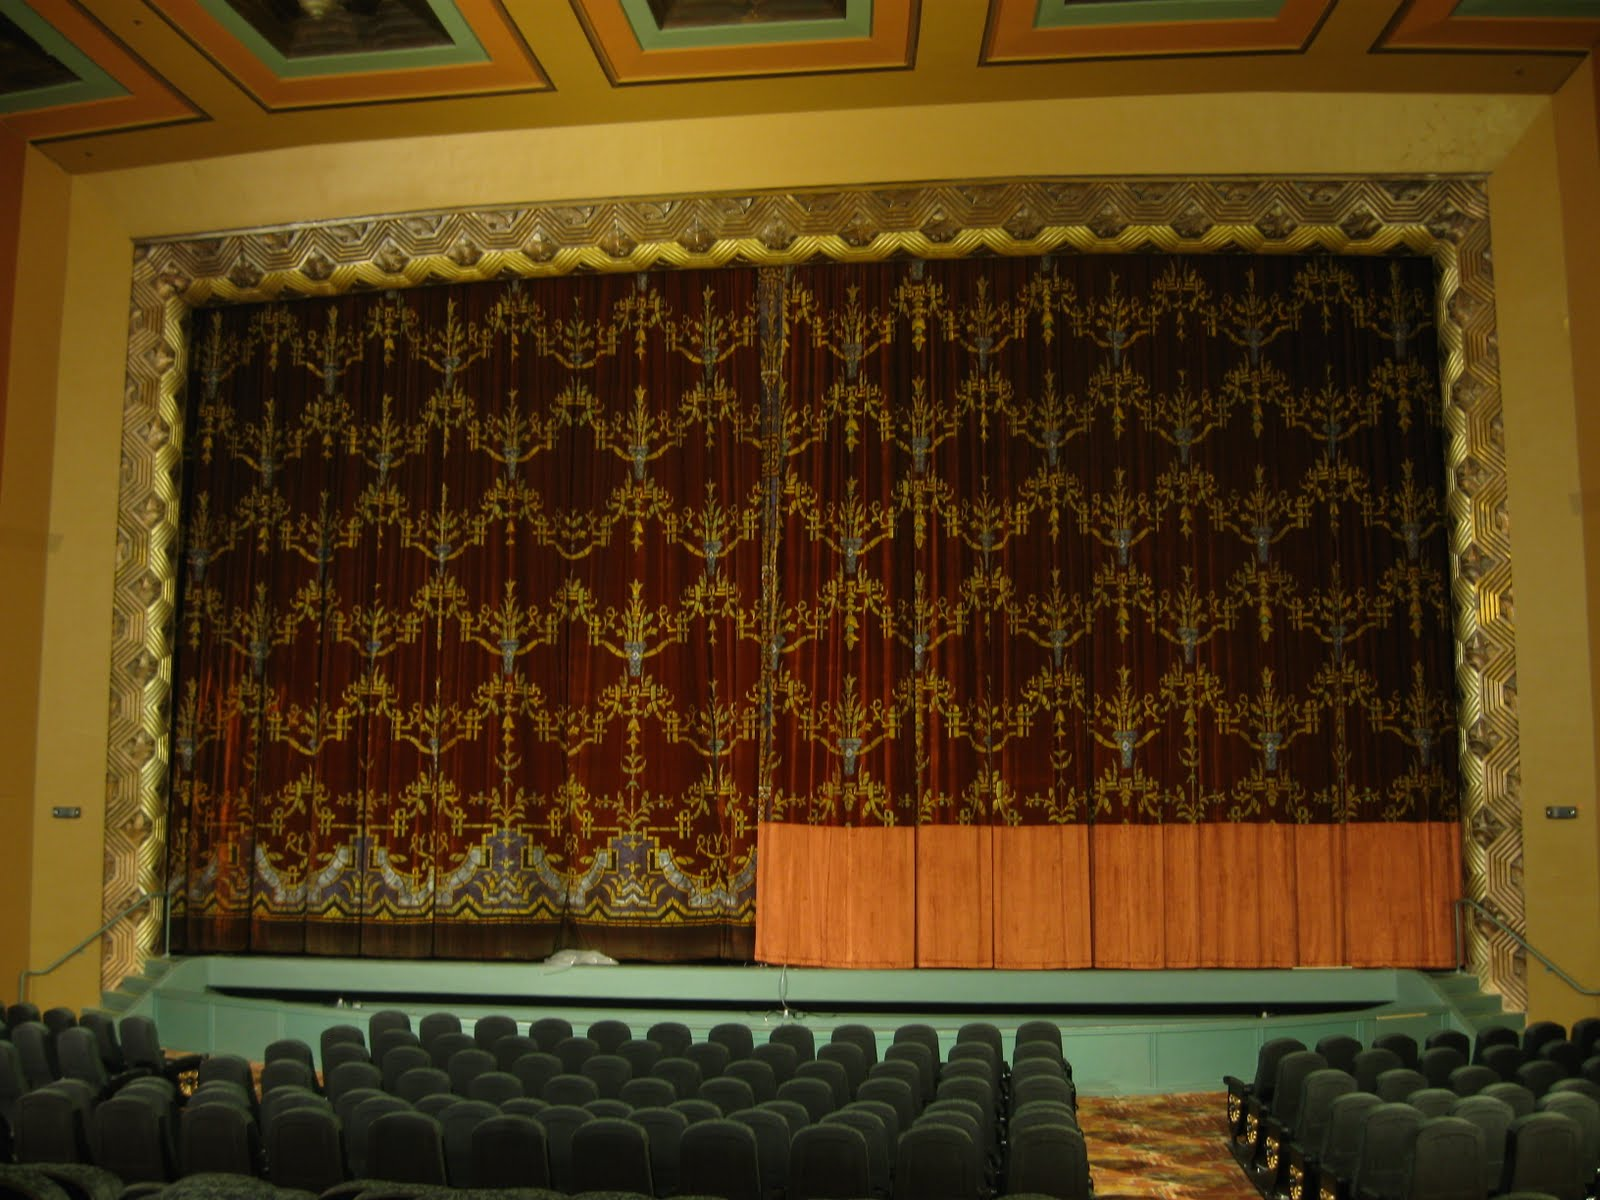 curtain art ideas shower deco home design curtains designs